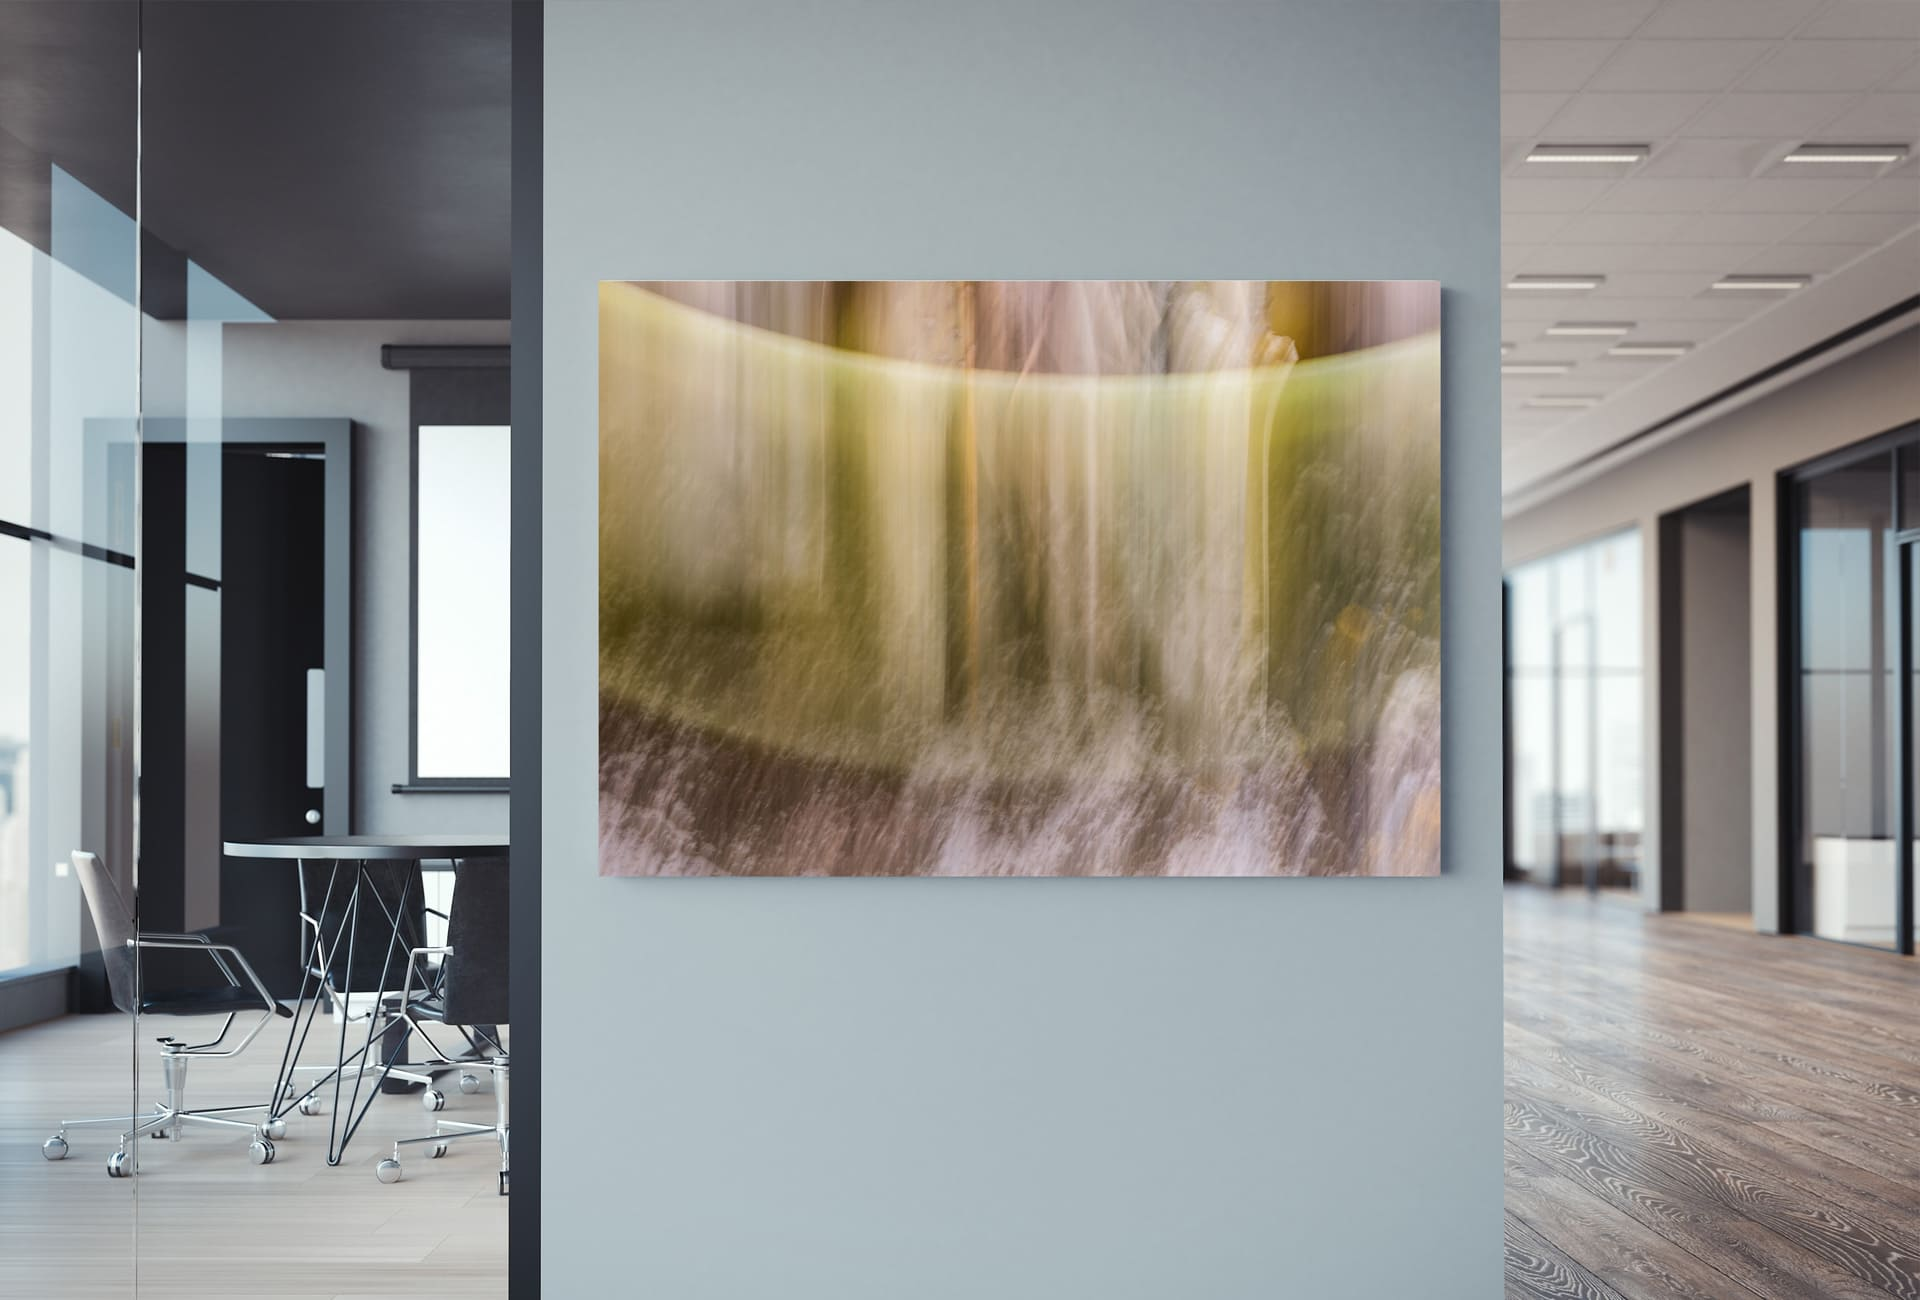 simoarts-com-simone-kessler-fotokunst-nuernberg-blumen-abstrakt-Motiv09A